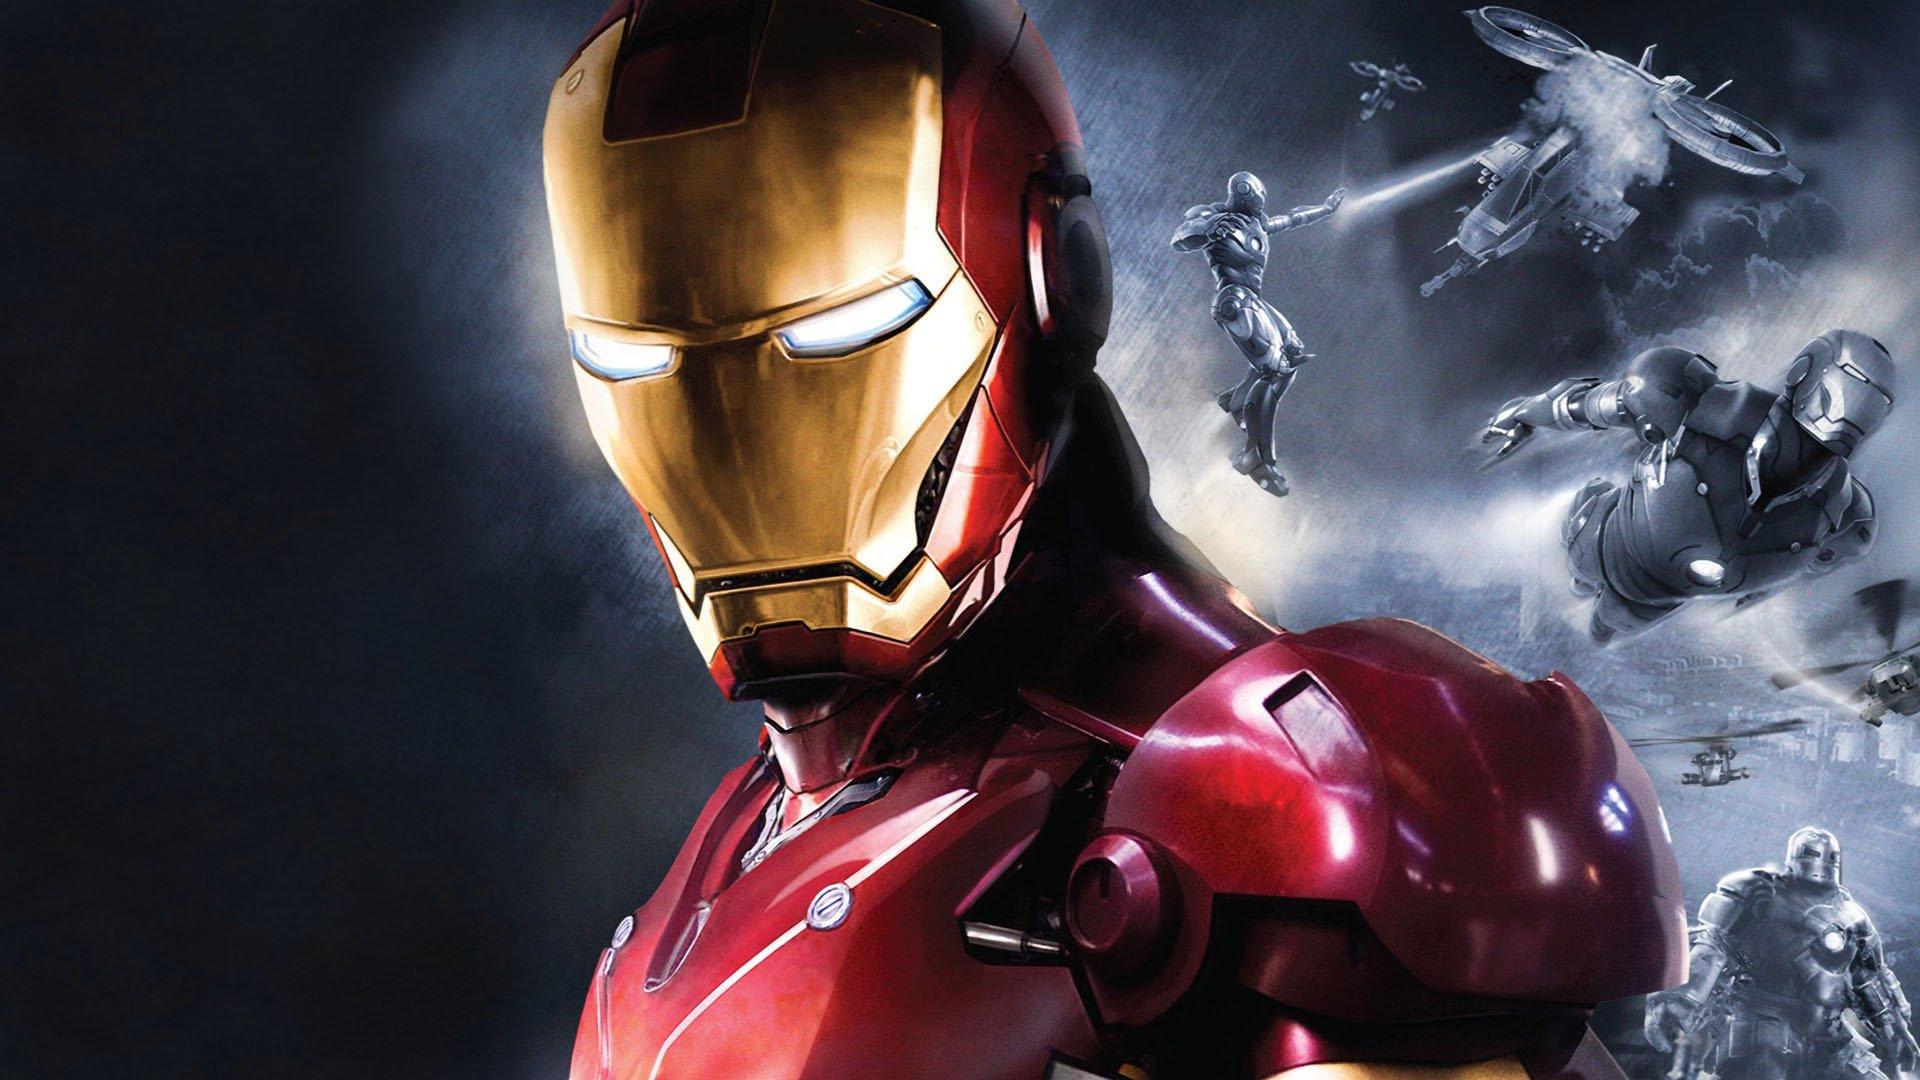 Civil War Artowork Iron Man Wallpapers HD Wallpapers HD wallpapers